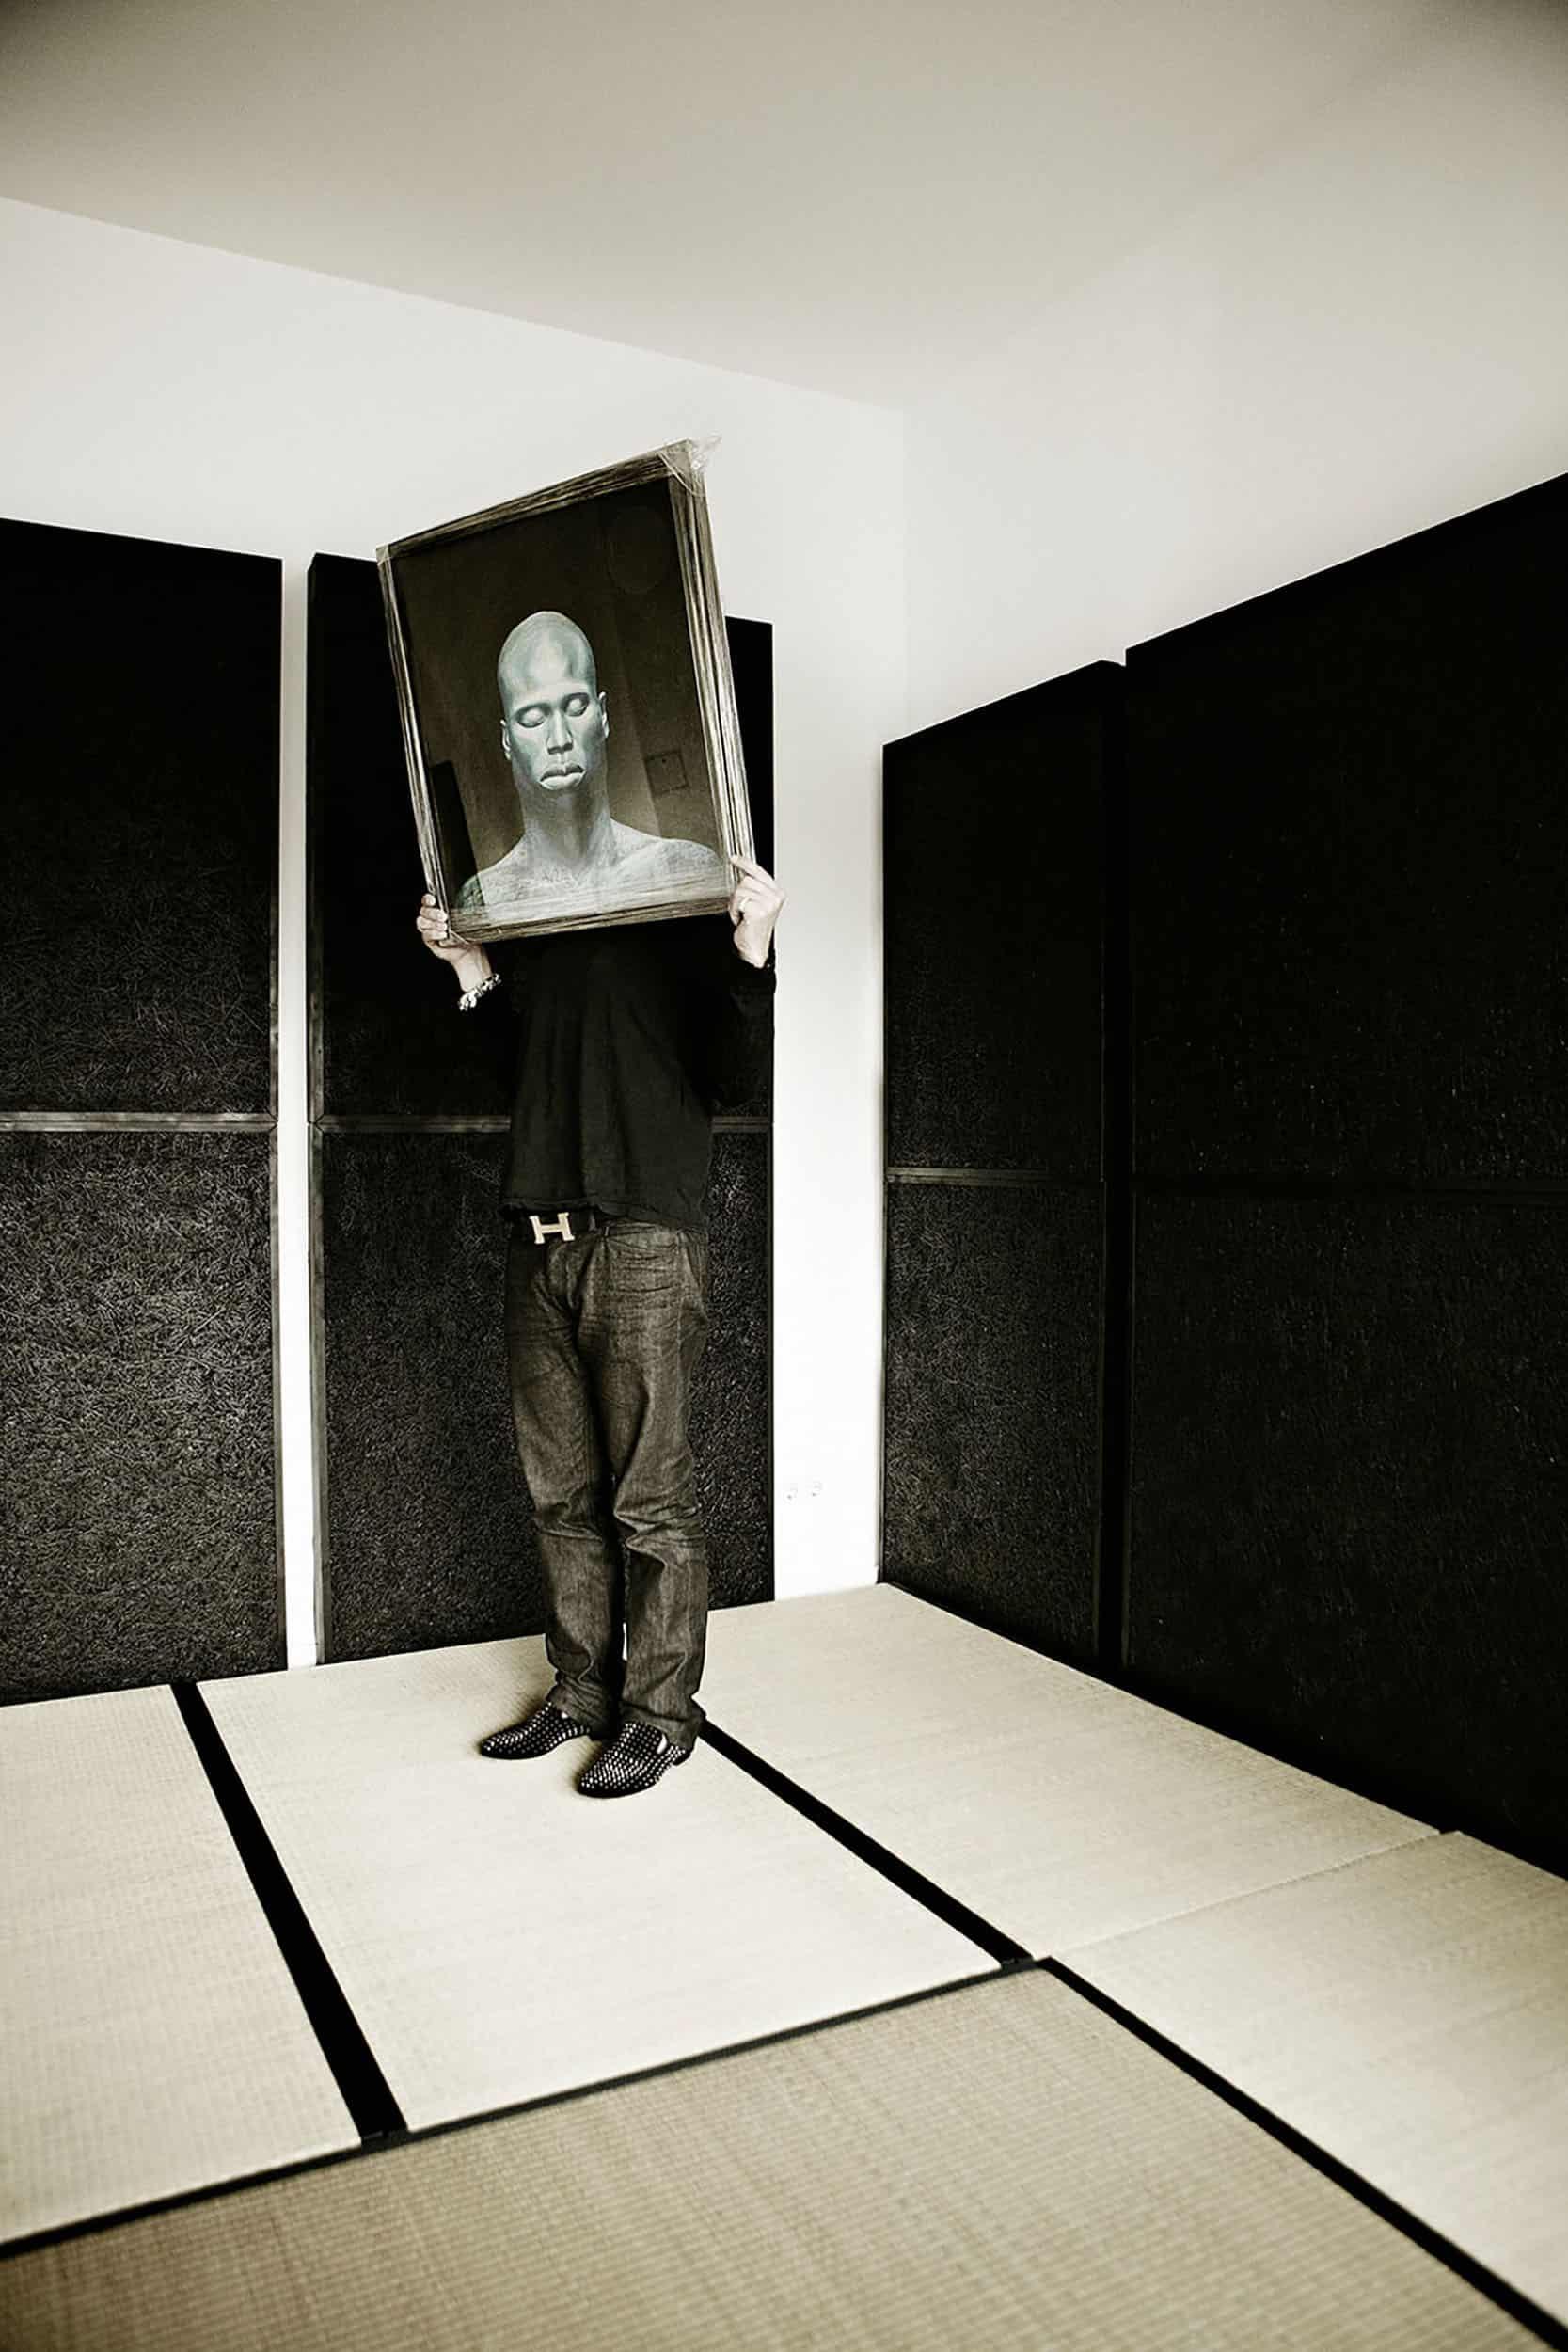 studio-ignatov-portrait-icberlin-ralph-anderl-06